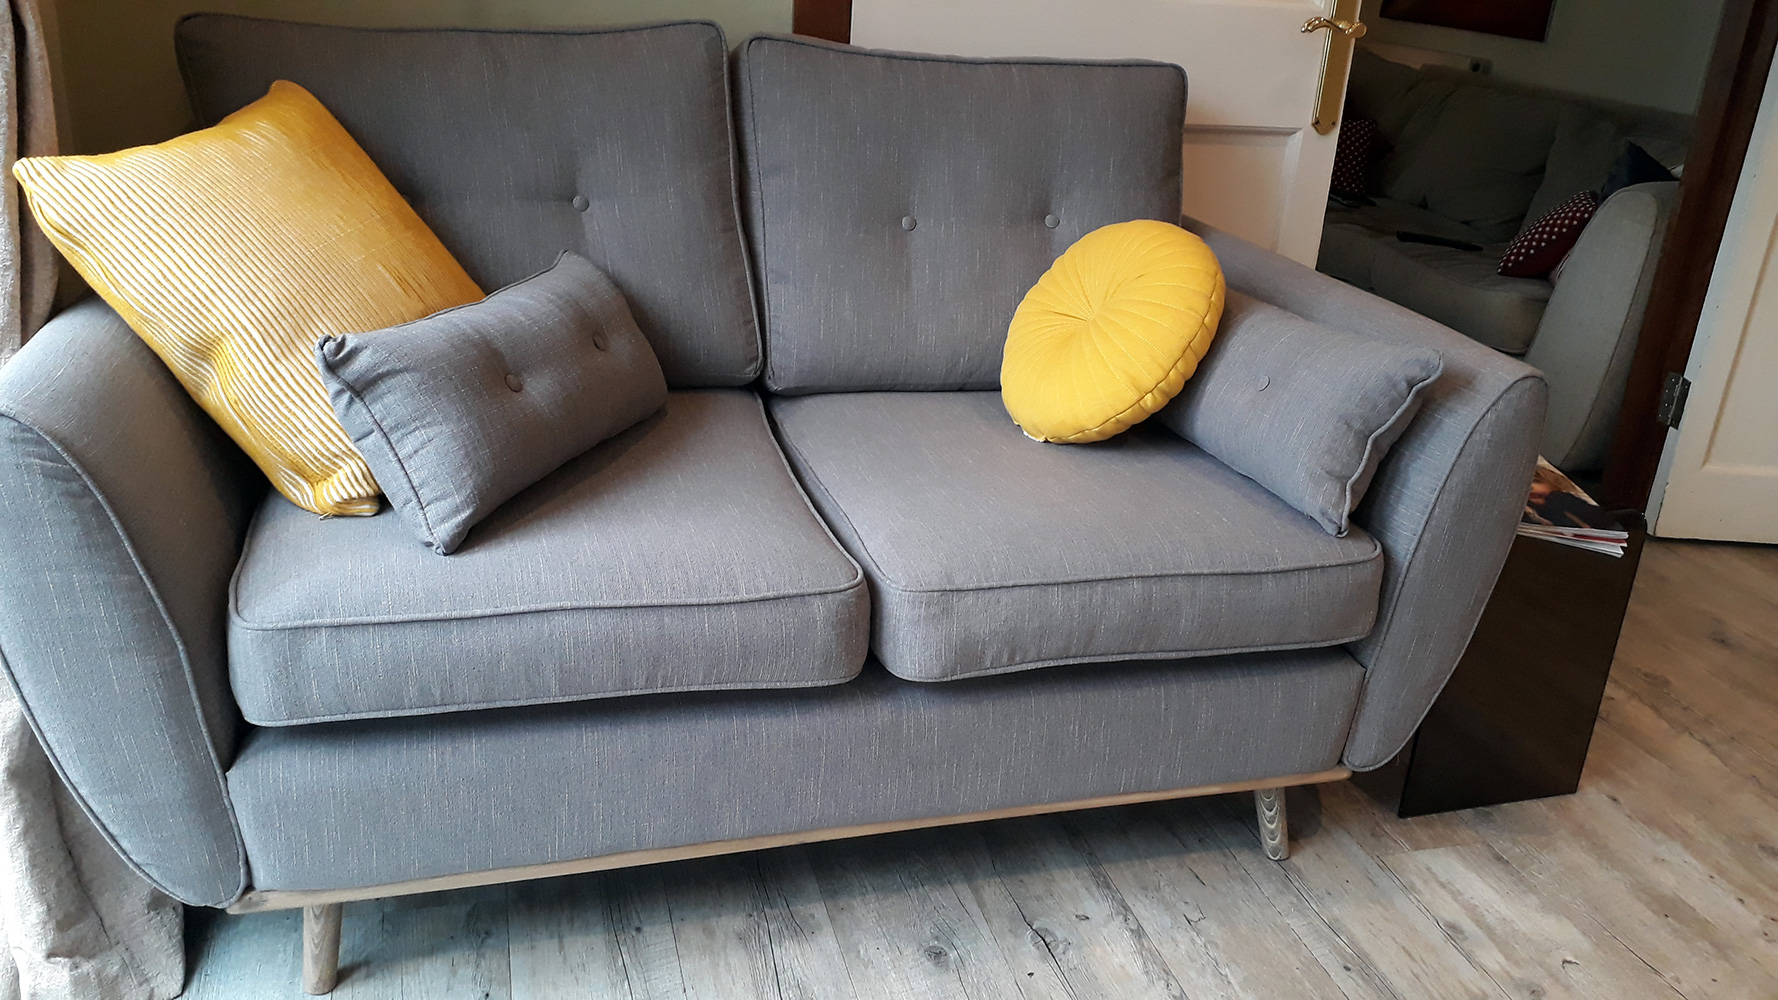 Small grey Zinola sofa with light wooden legs